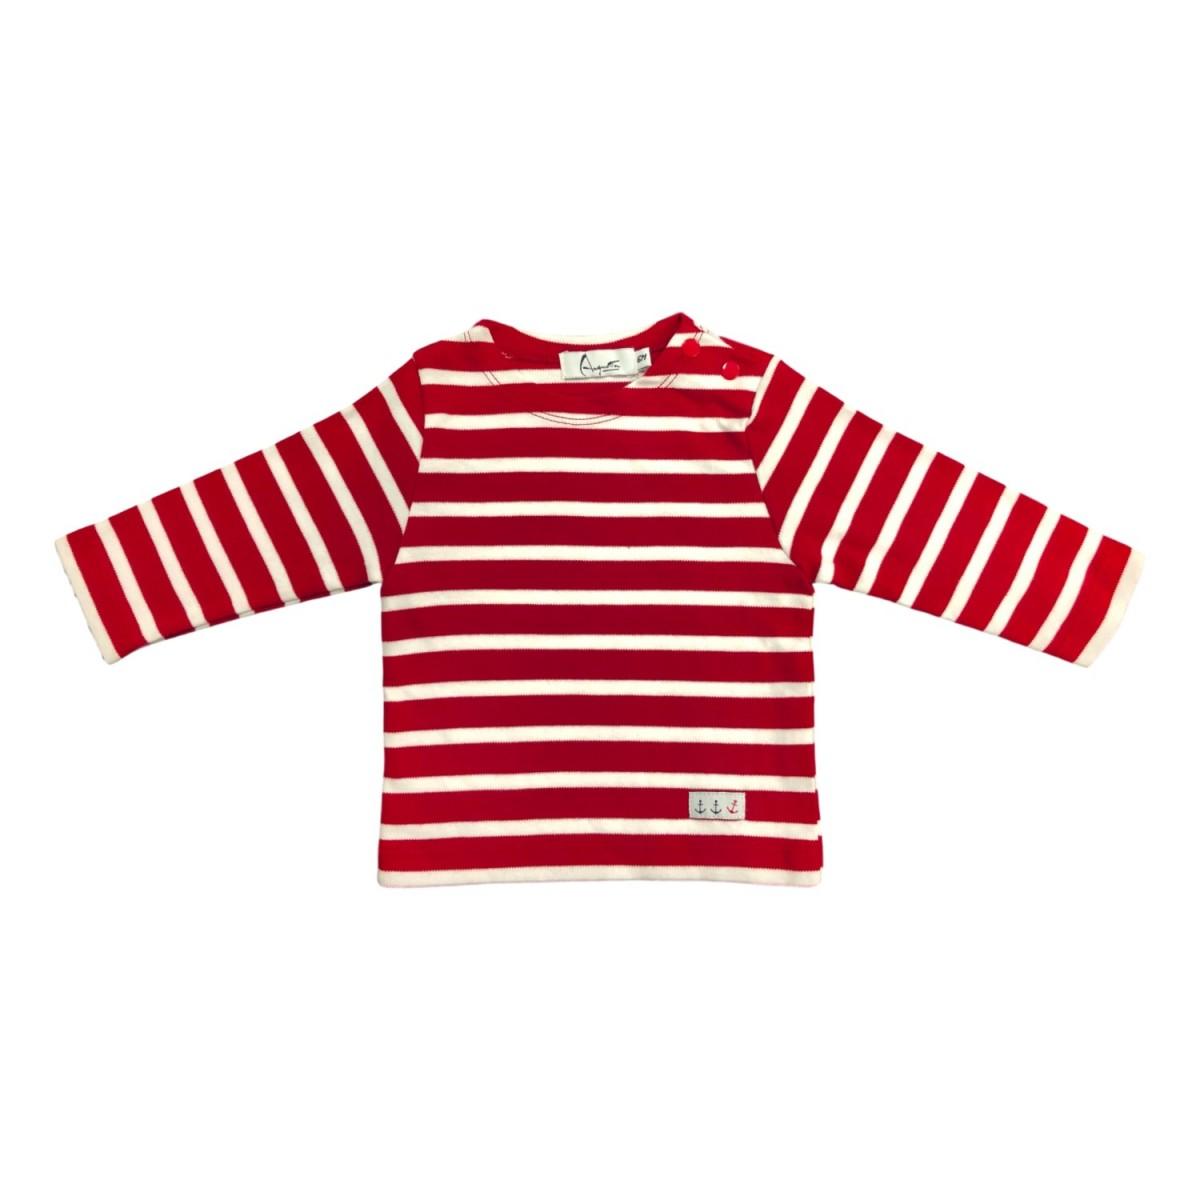 Breton Shirt long sleeves red color children